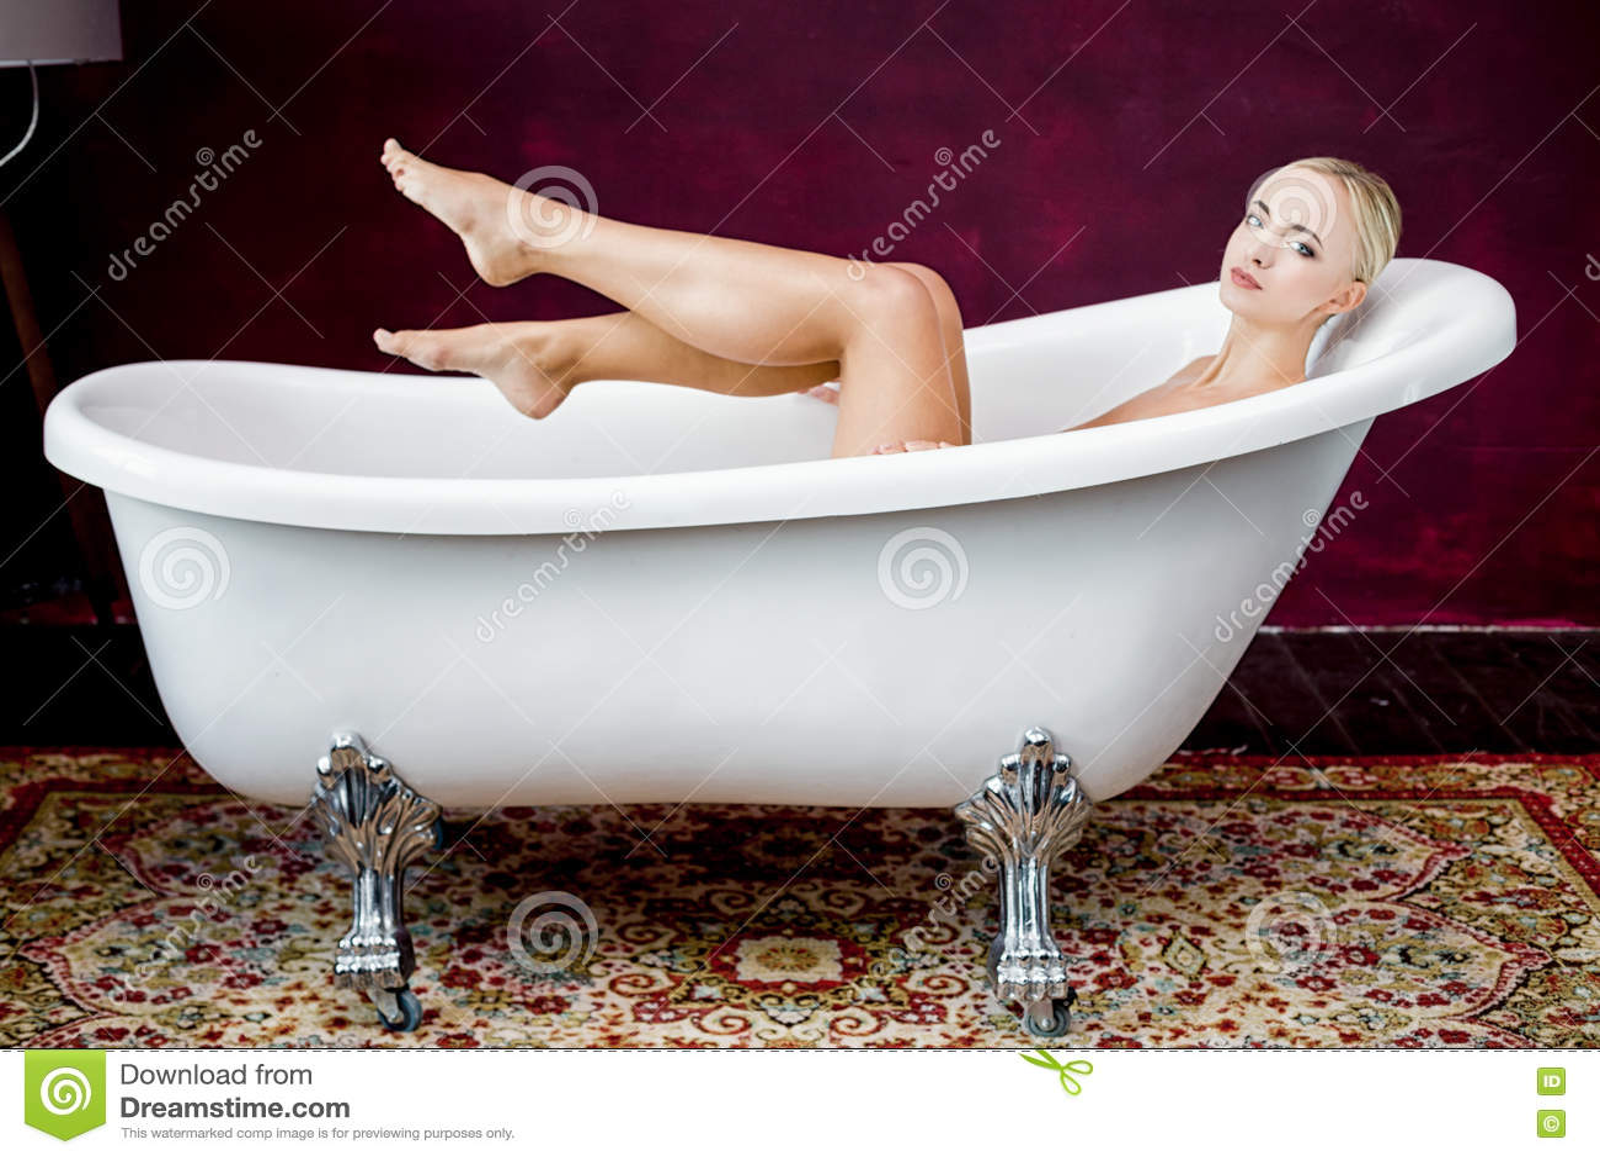 Christina taylor ebony porn